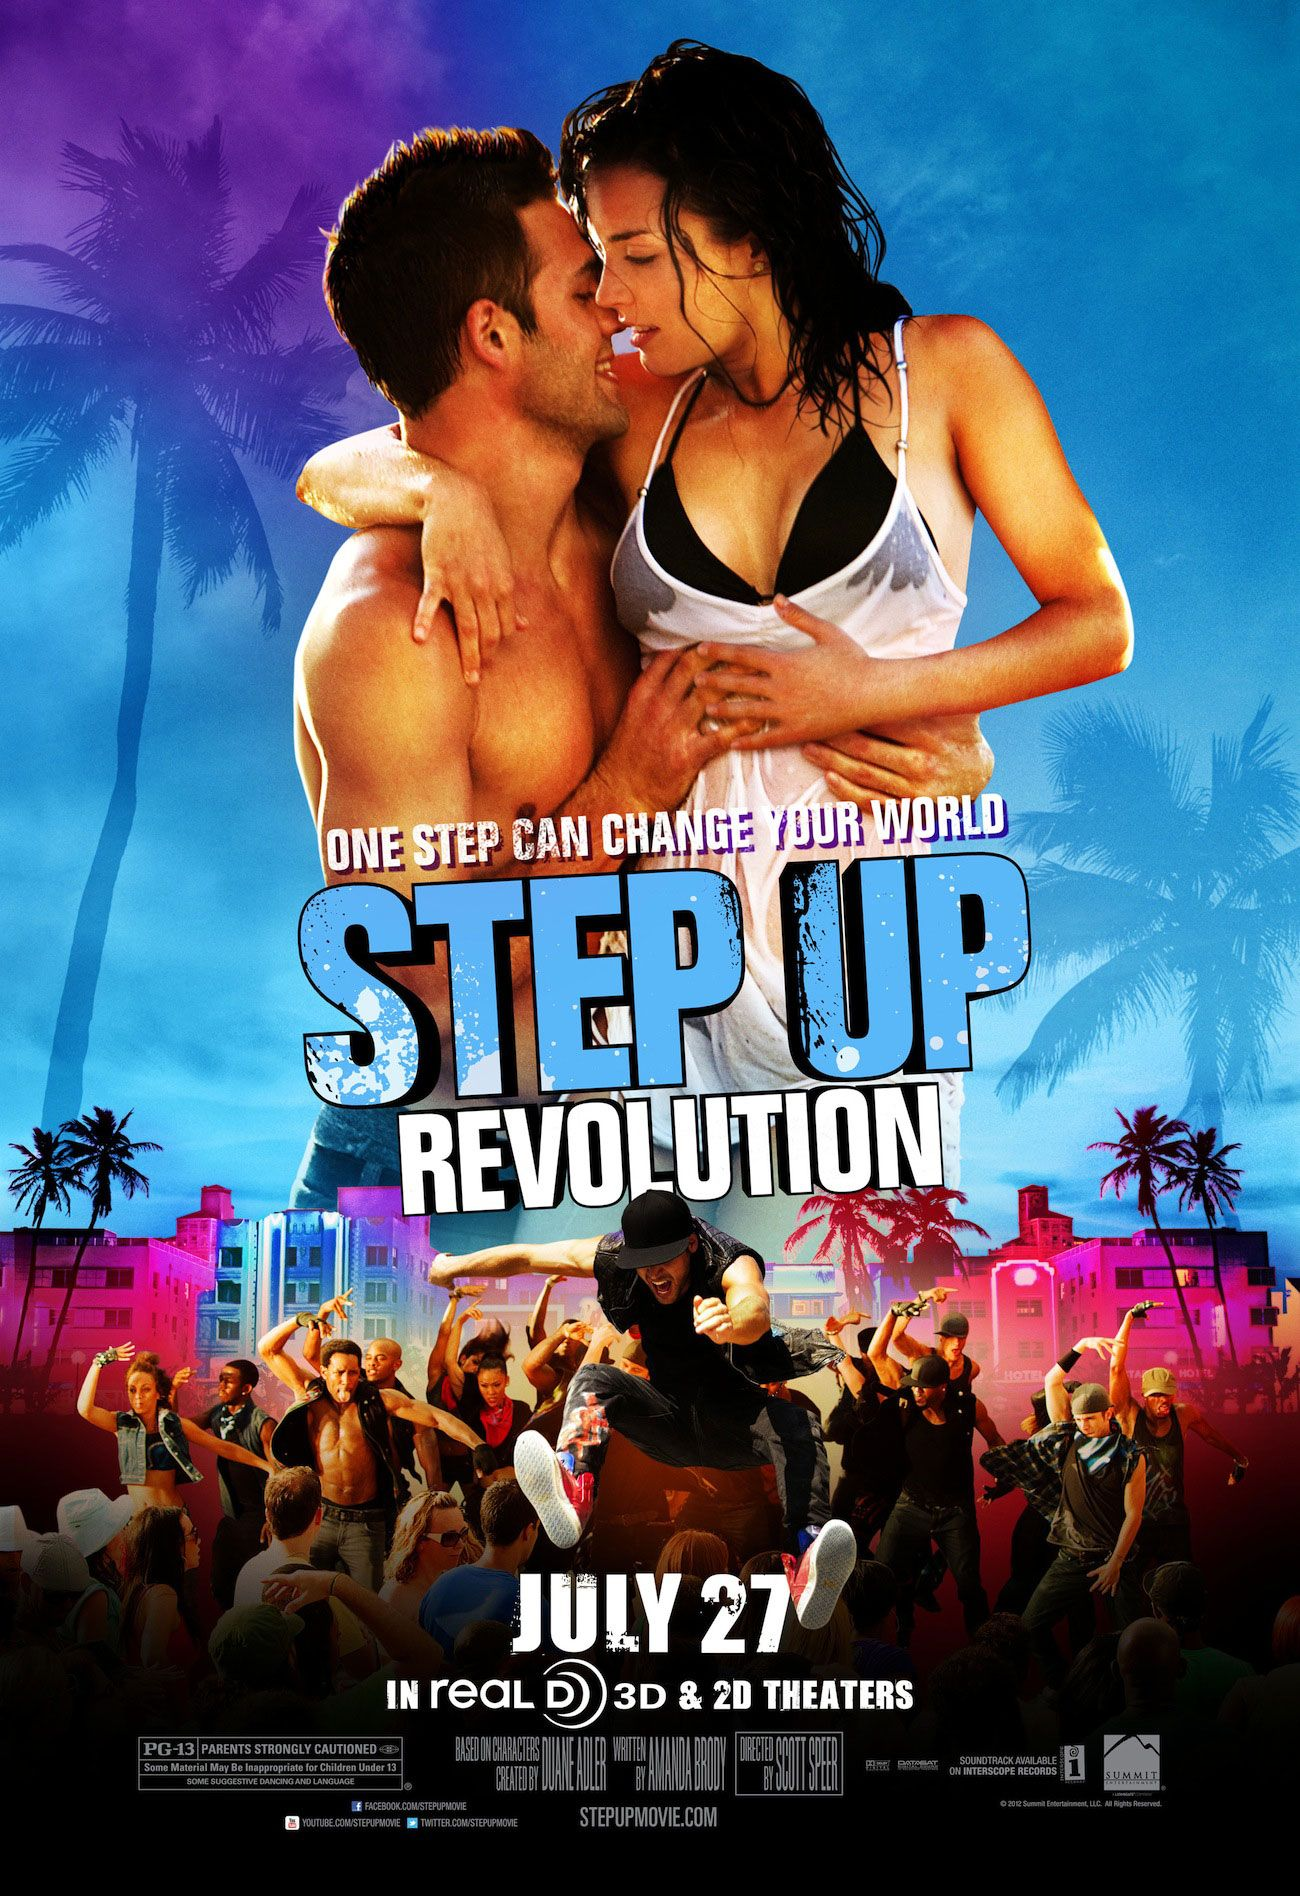 Step Up Revolution Starring Kathryn Mccormick Ryan Guzman Cleopatra Coleman Misha Gabriel Hamilton Emily Arrives In Film Affiche Film Choregraphie Danse